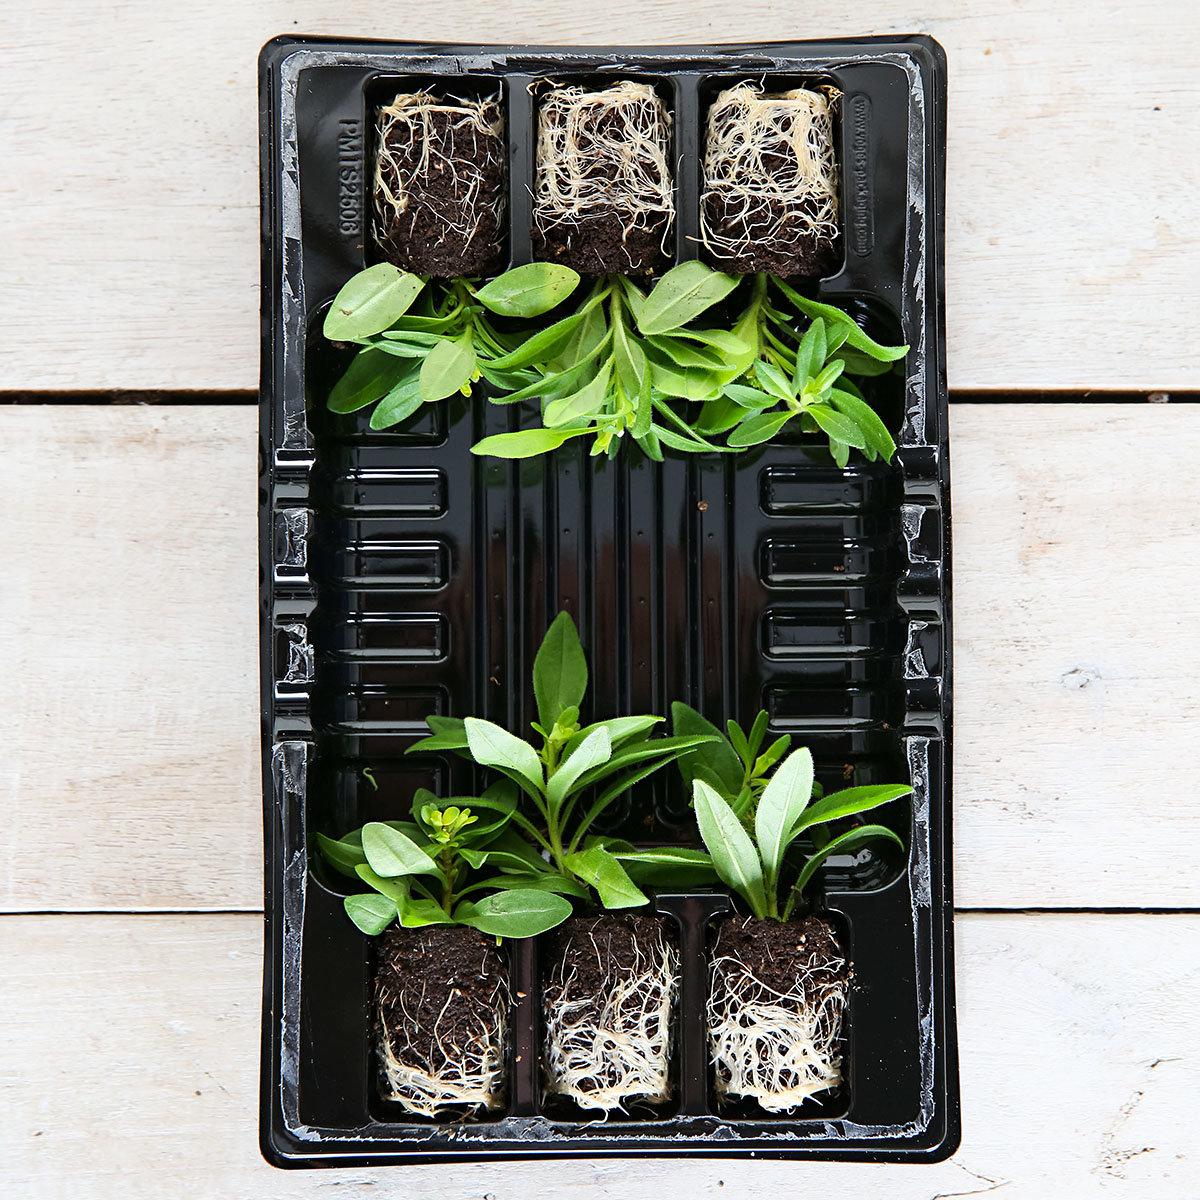 Mini-Jungpflanze Calibrachoa-Petunie Chameleon   #3